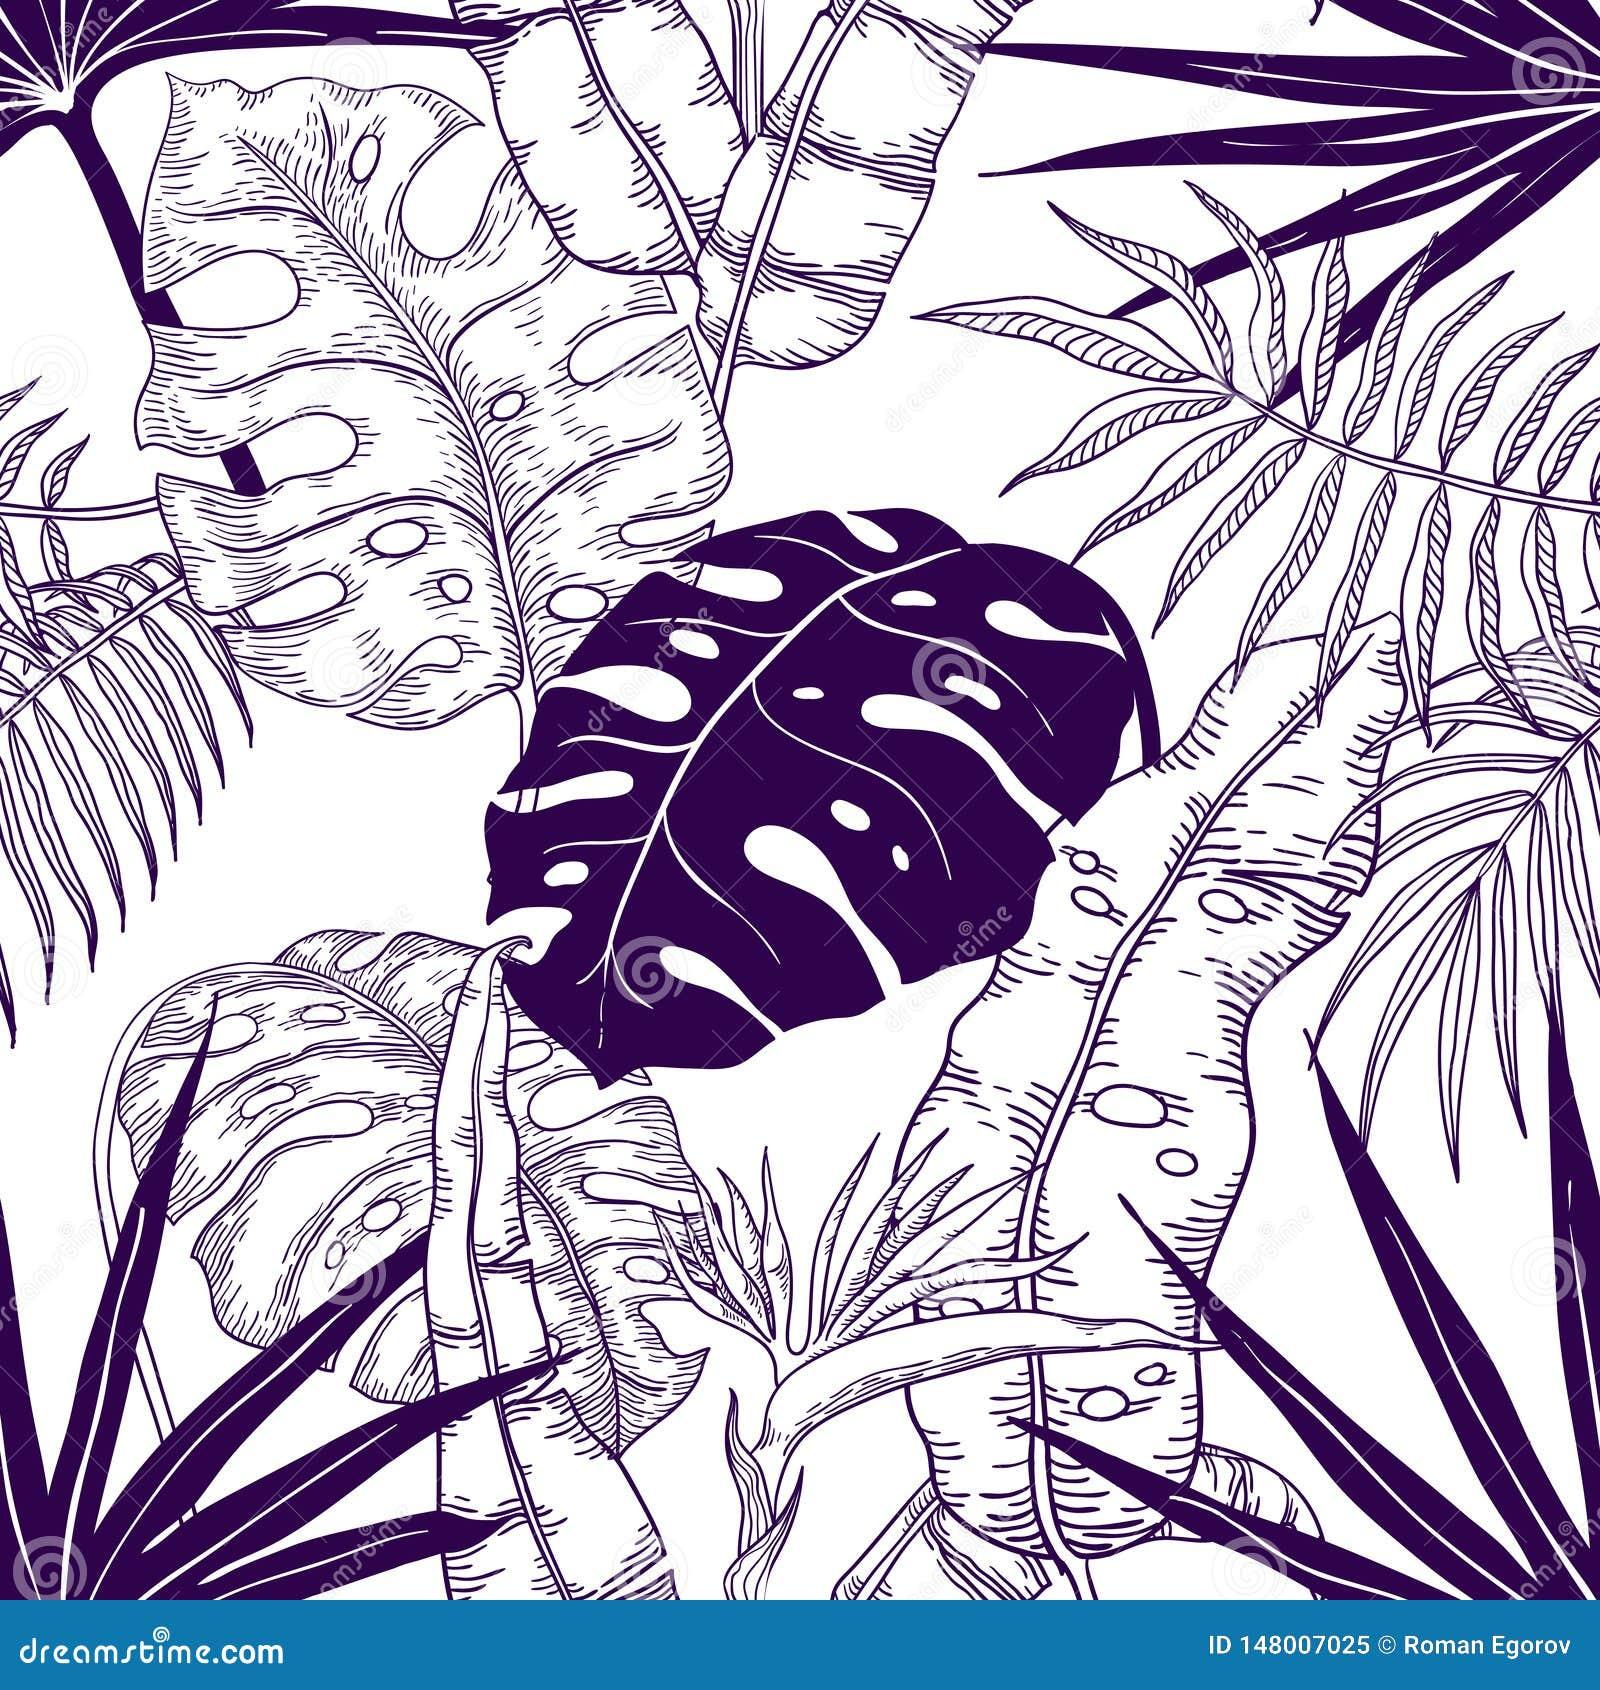 Palm leaves seamless pattern. Plant vintage wallpaper, floral line print texture, tropic garden textile pattern. Vector